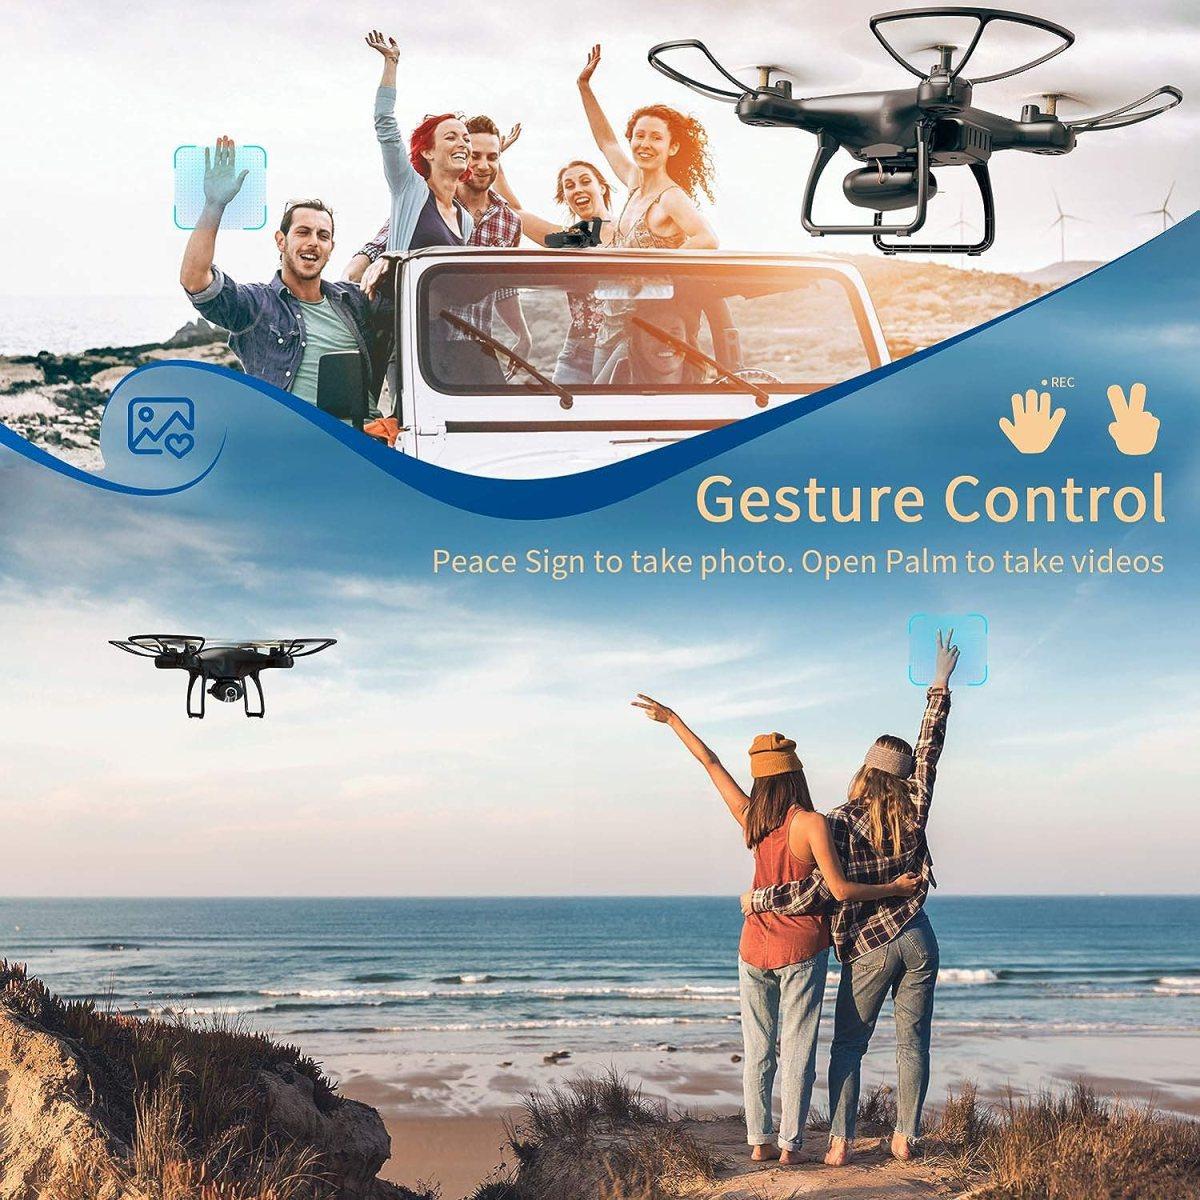 blade 720 Drone camera